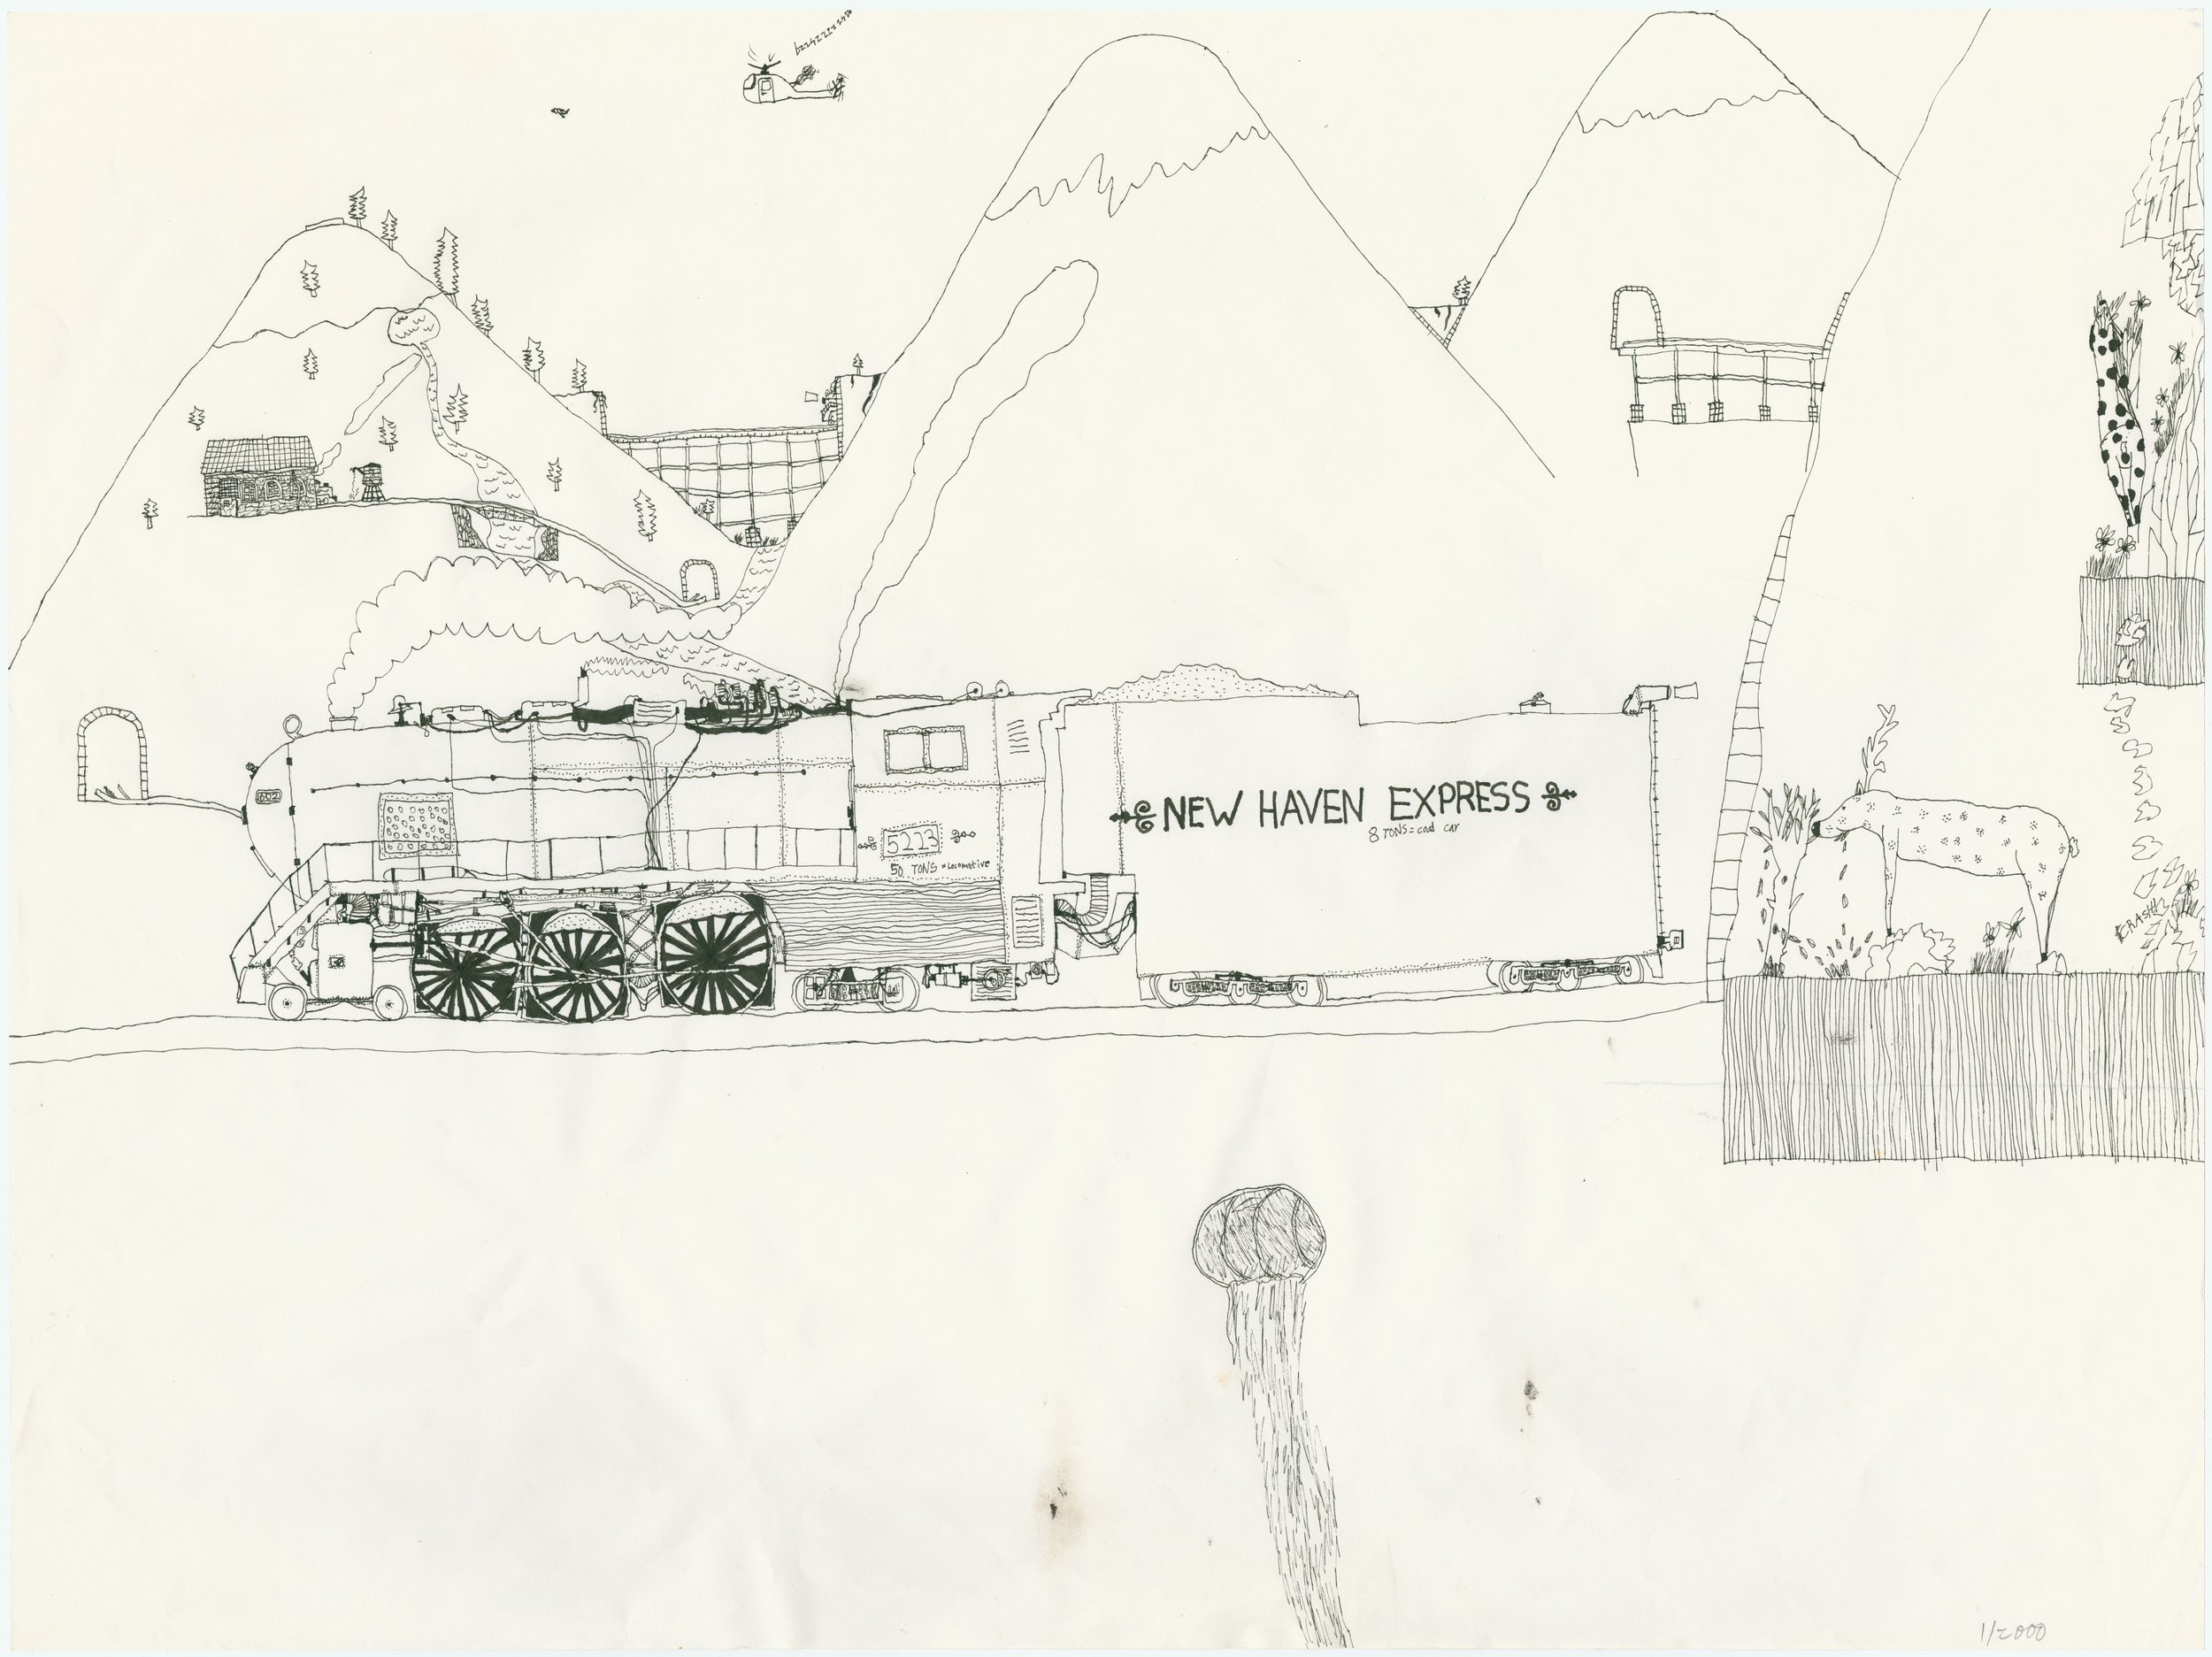 2000.01 - 002 - New Haven Express.pdf0000.jpg